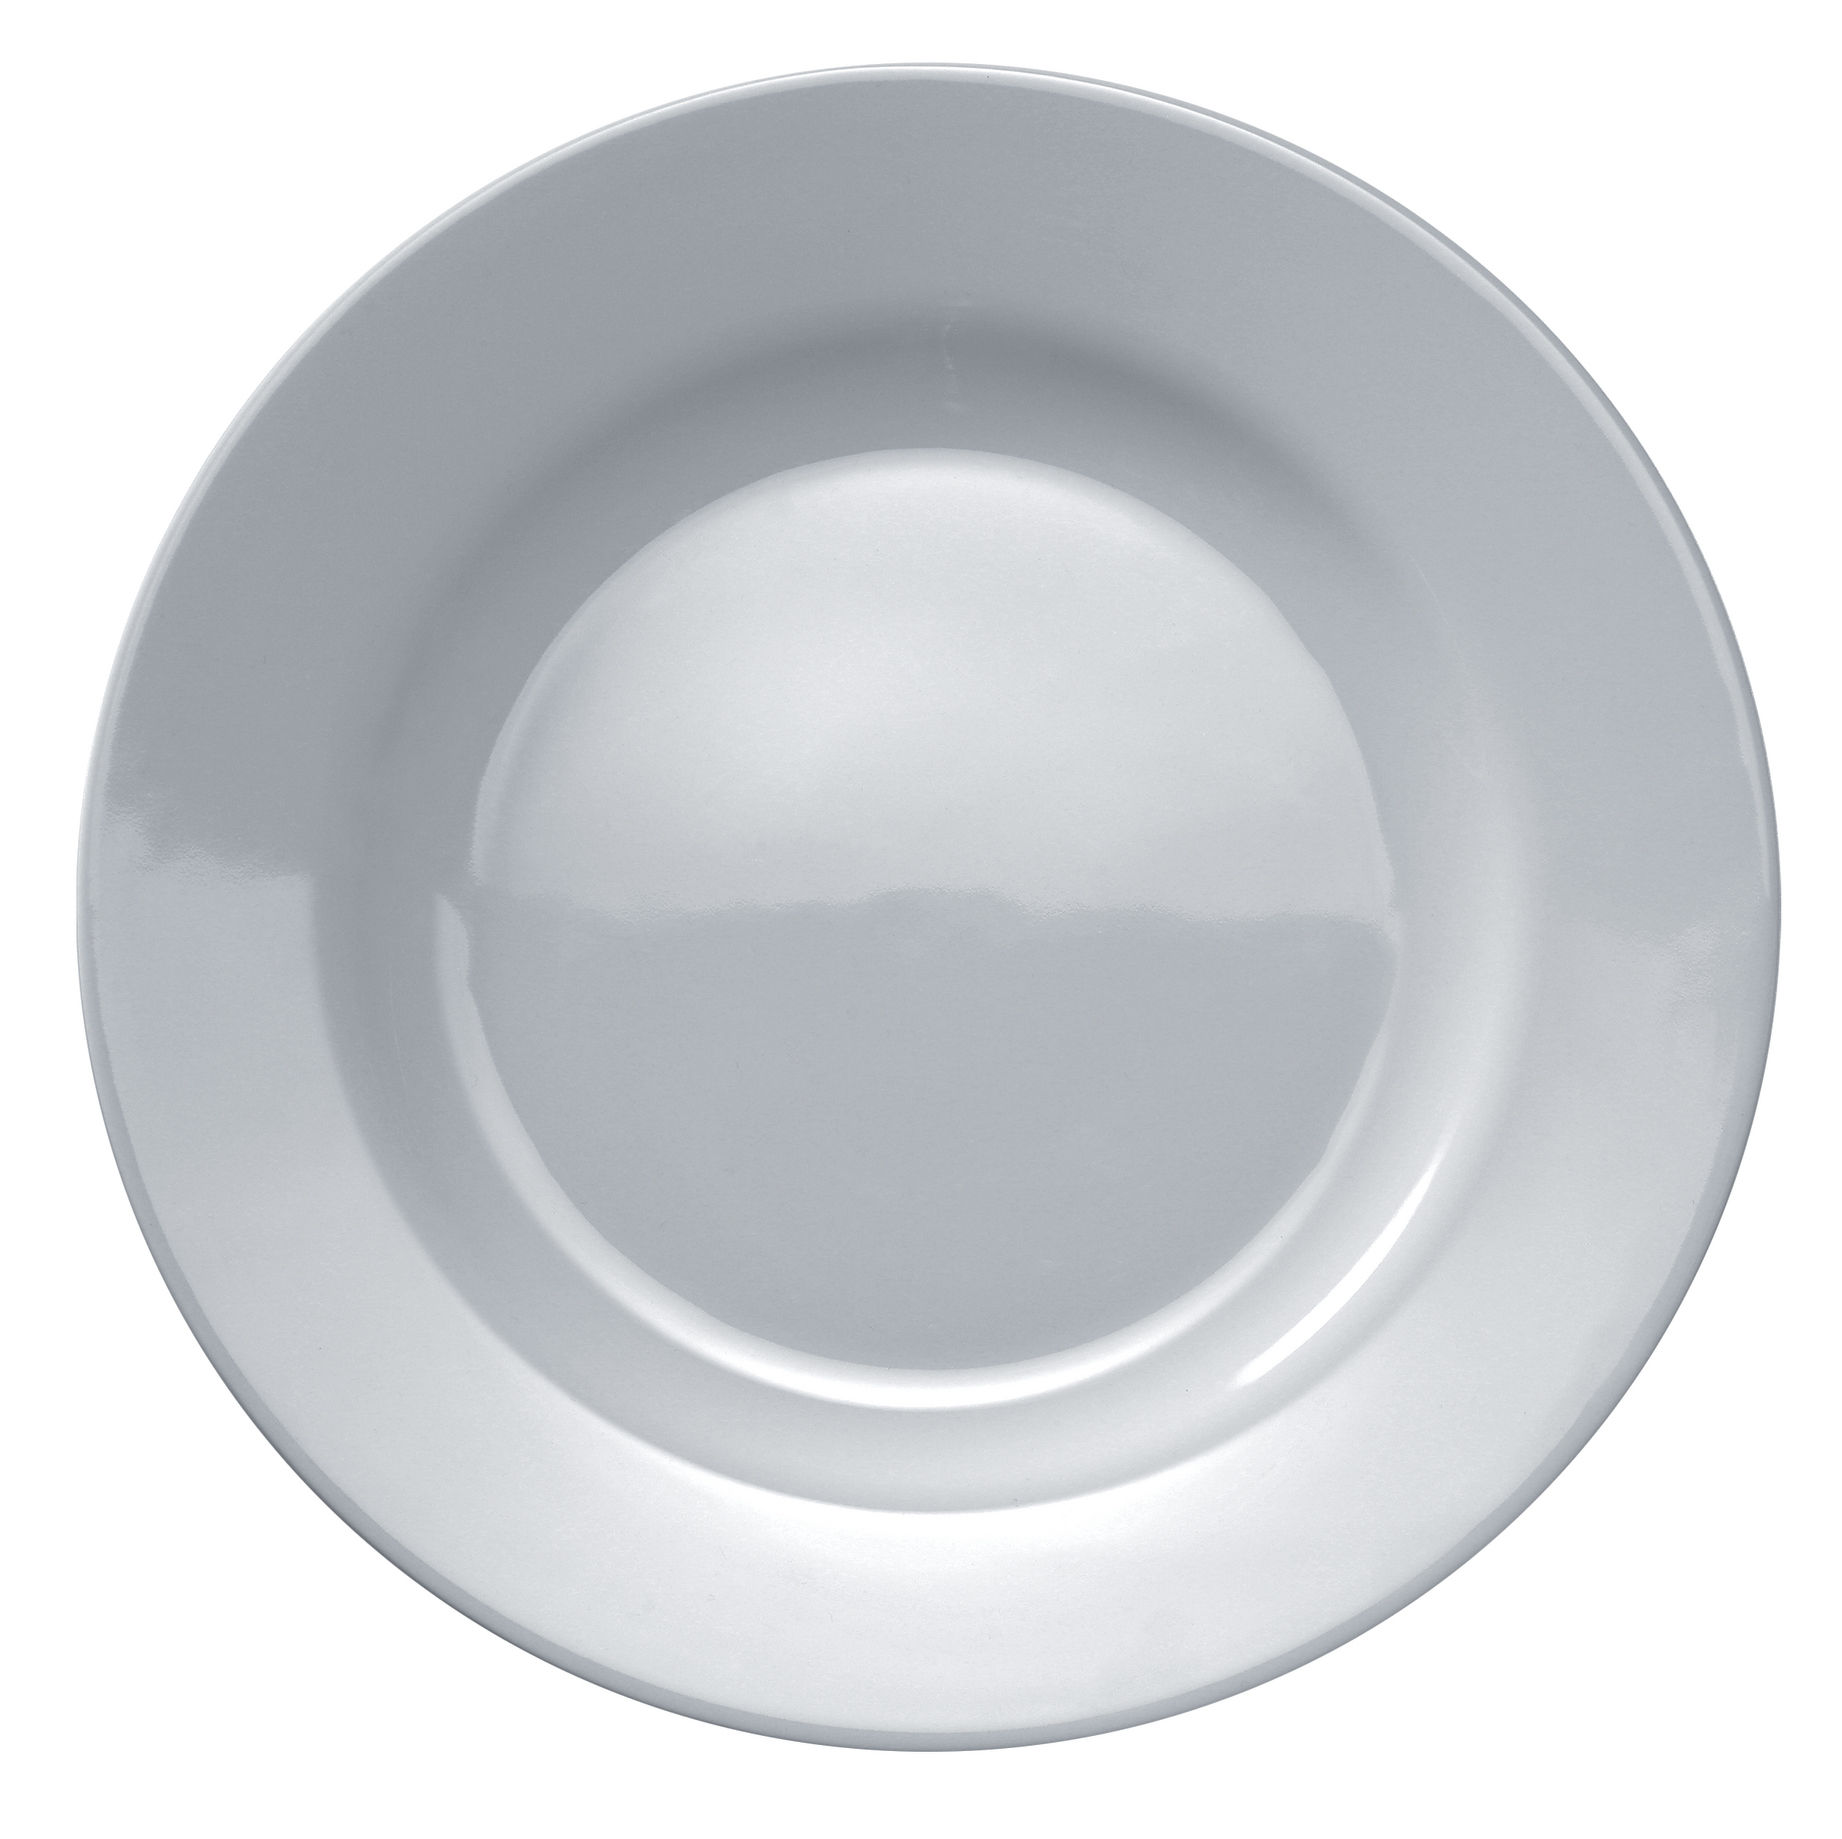 Tavola - Piatti  - Piatto Platebowlcup di A di Alessi - Bianco - Porcellana